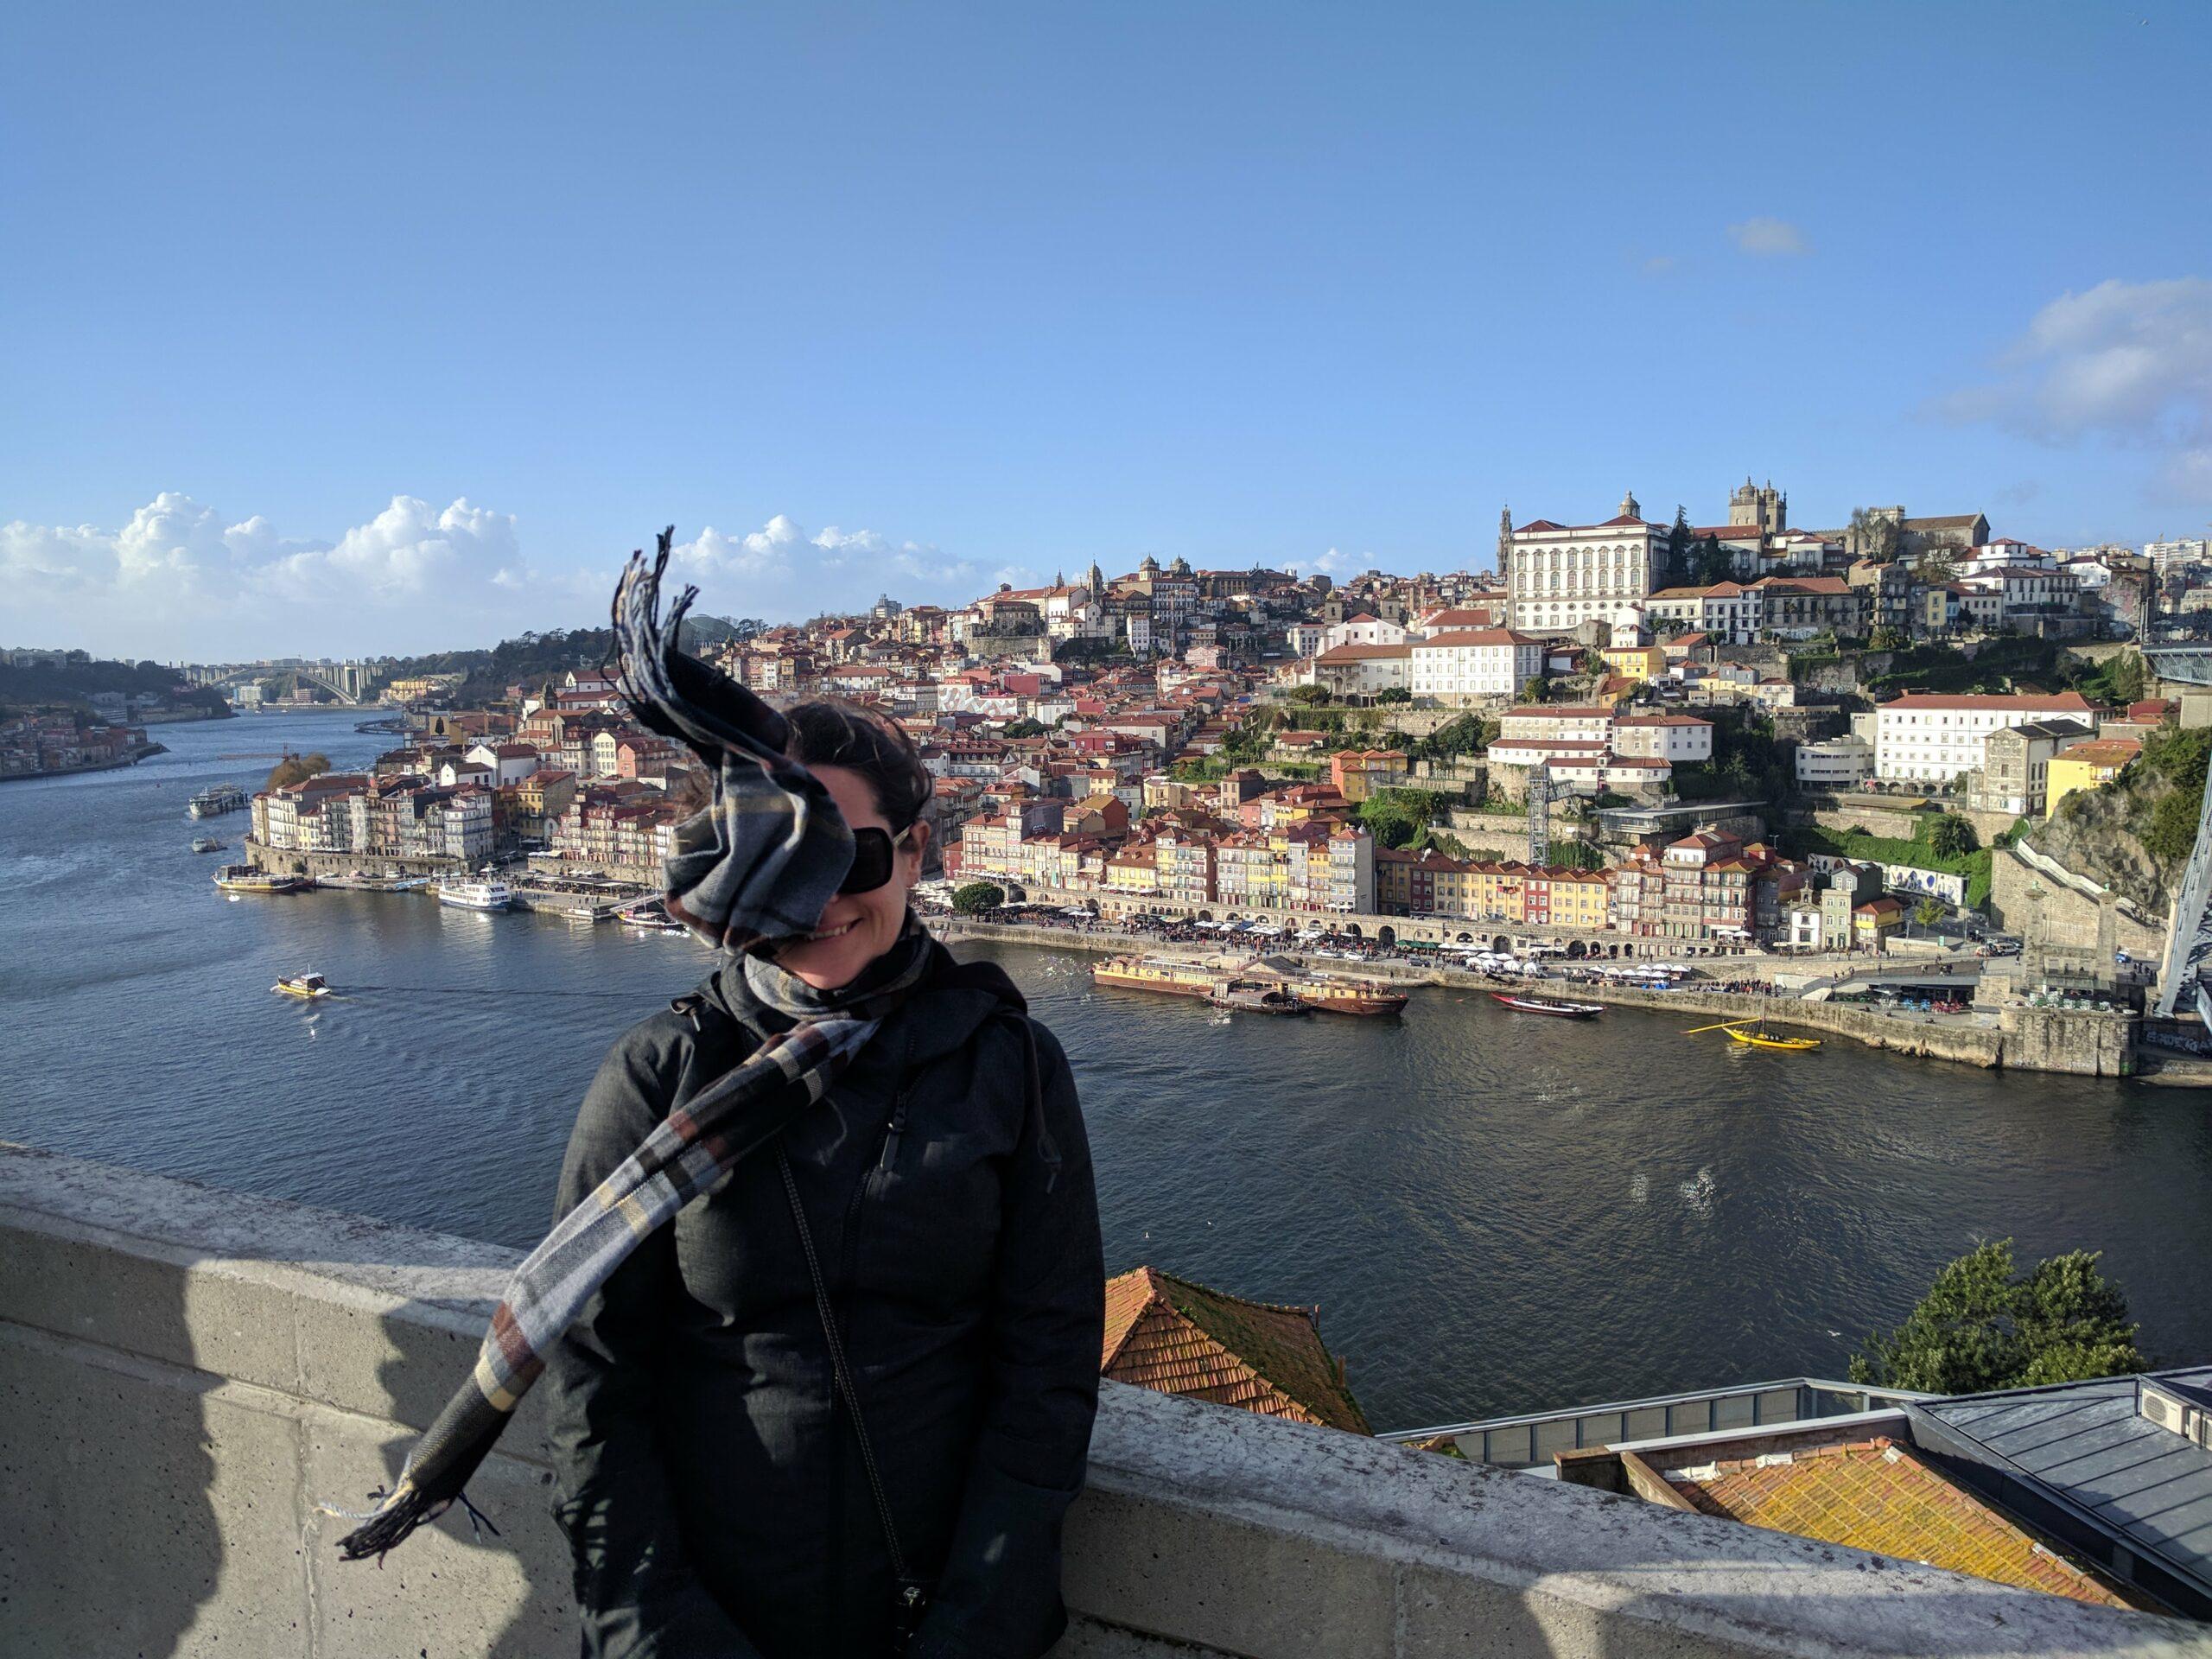 It was a windy day in Porto